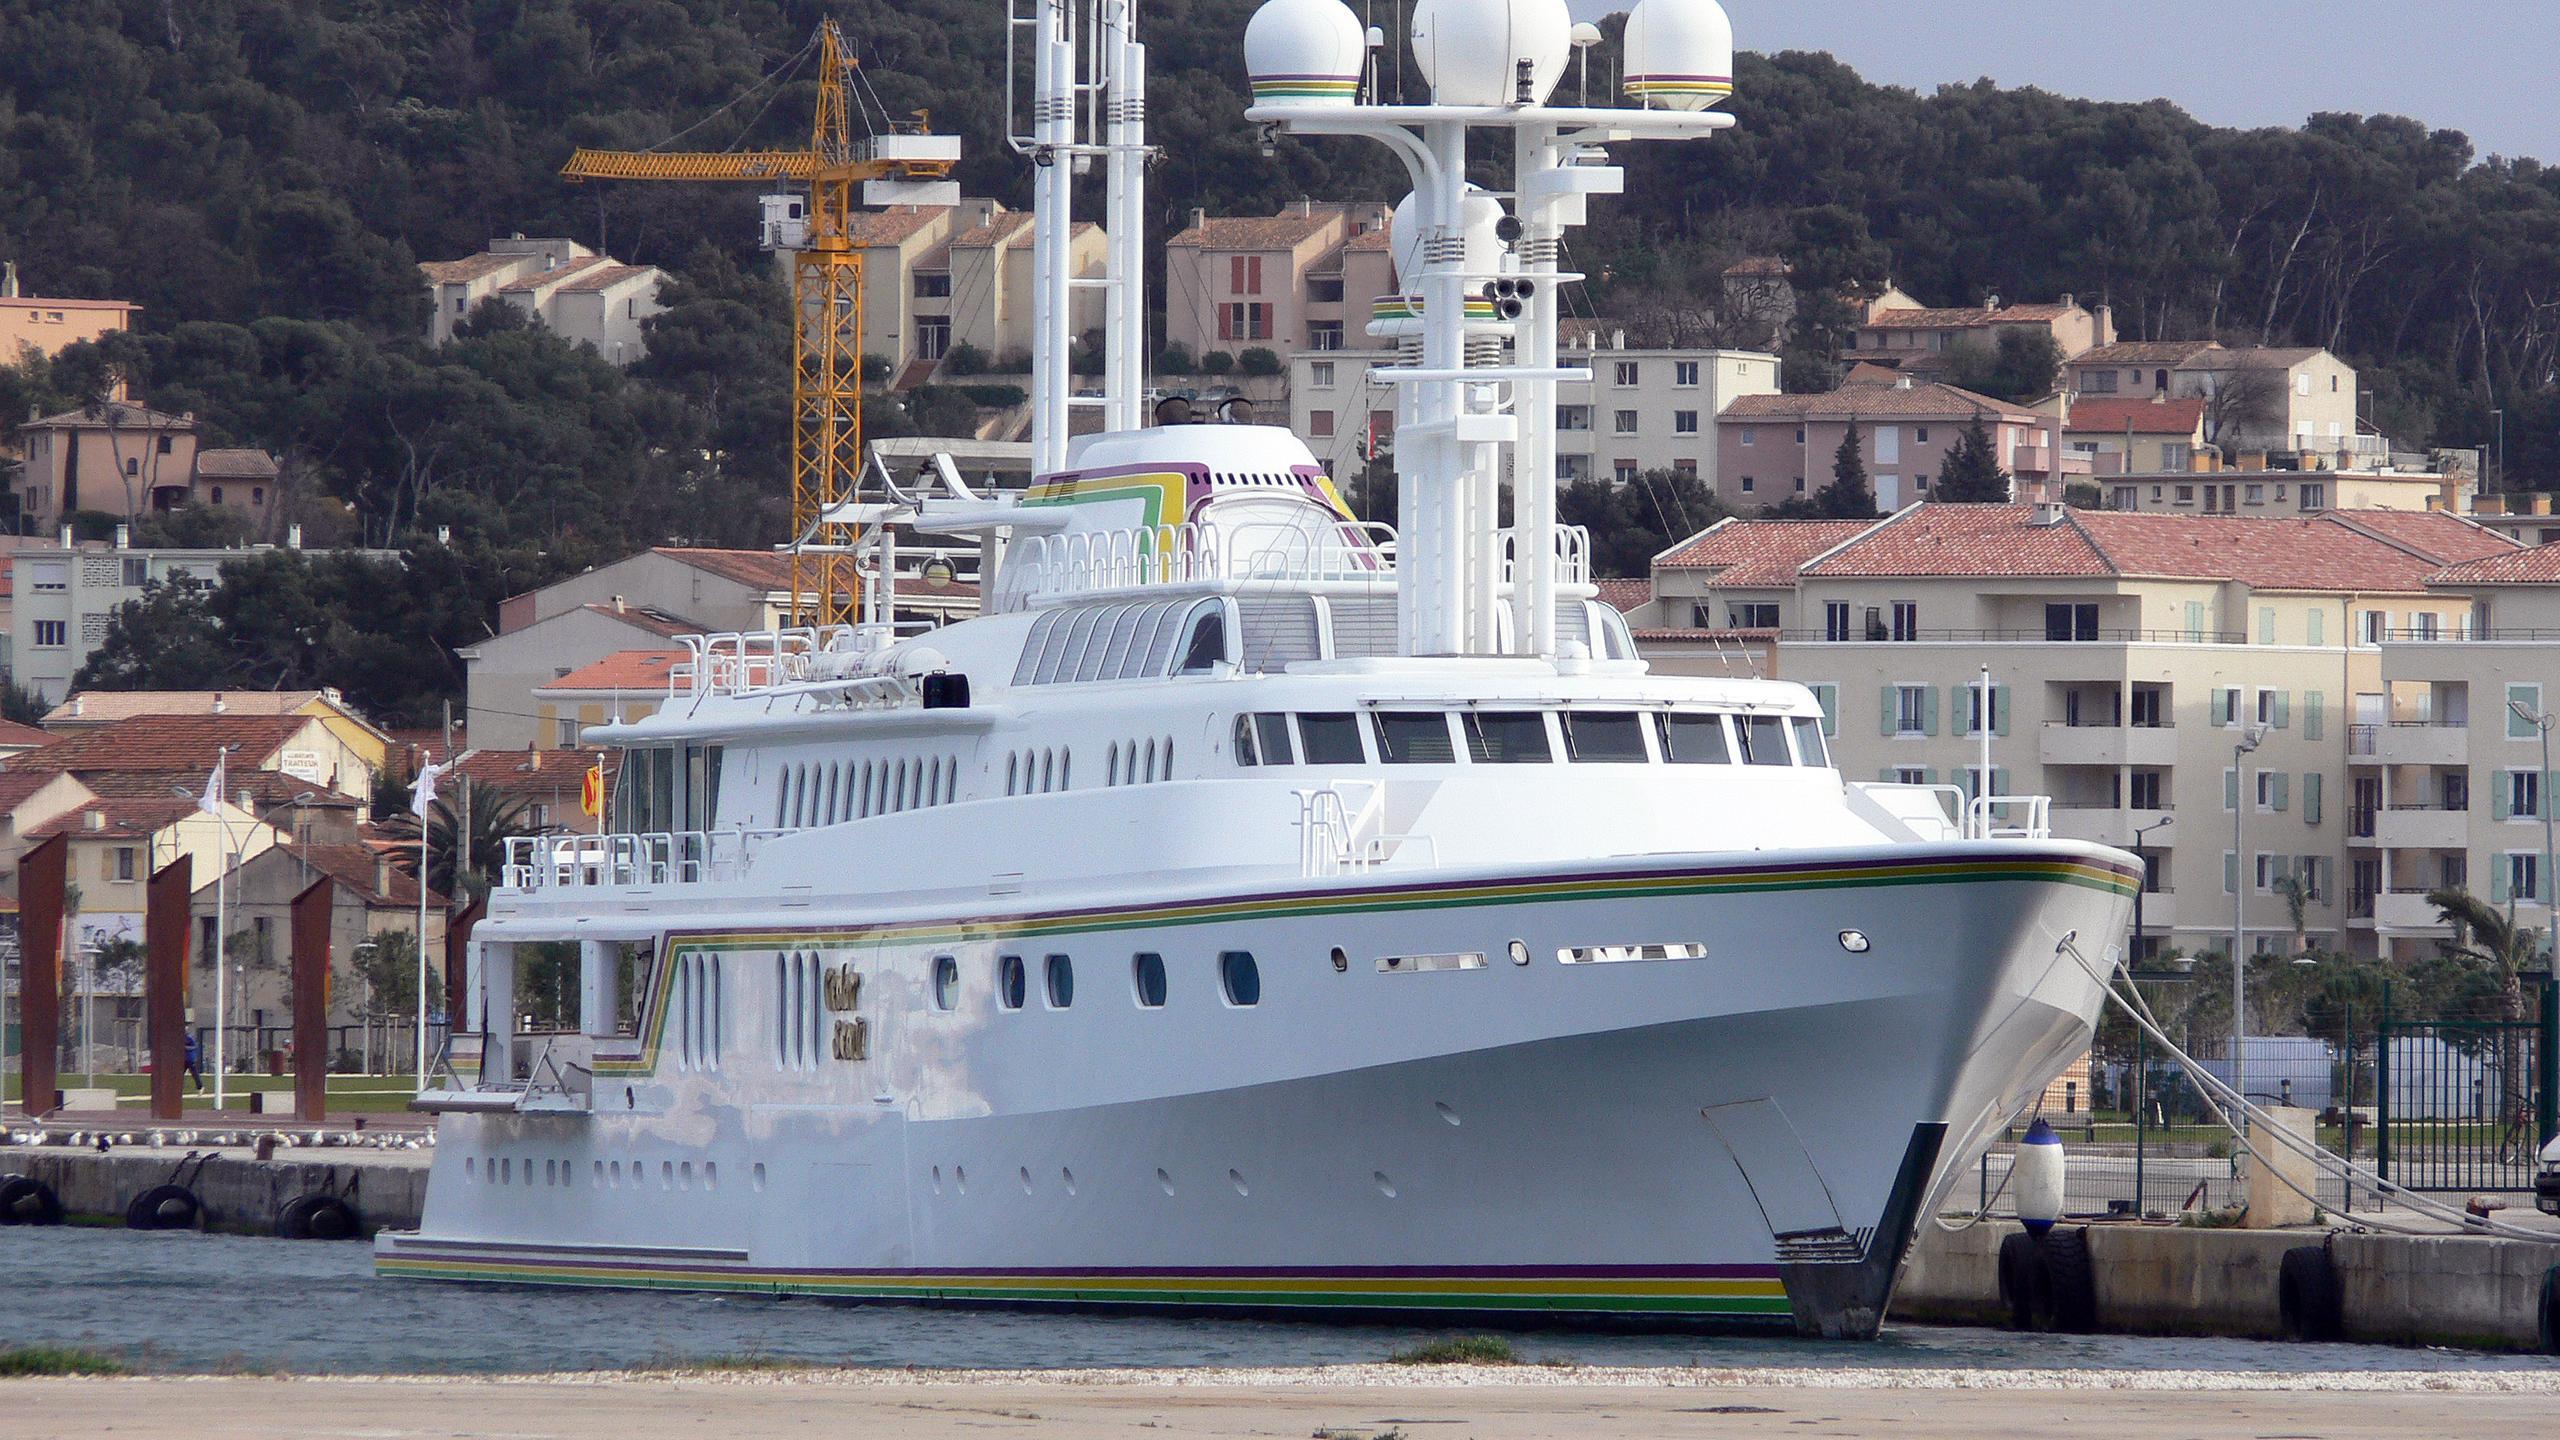 cedar-sea-ii-motor-yacht-feadship-1986-65m-bow